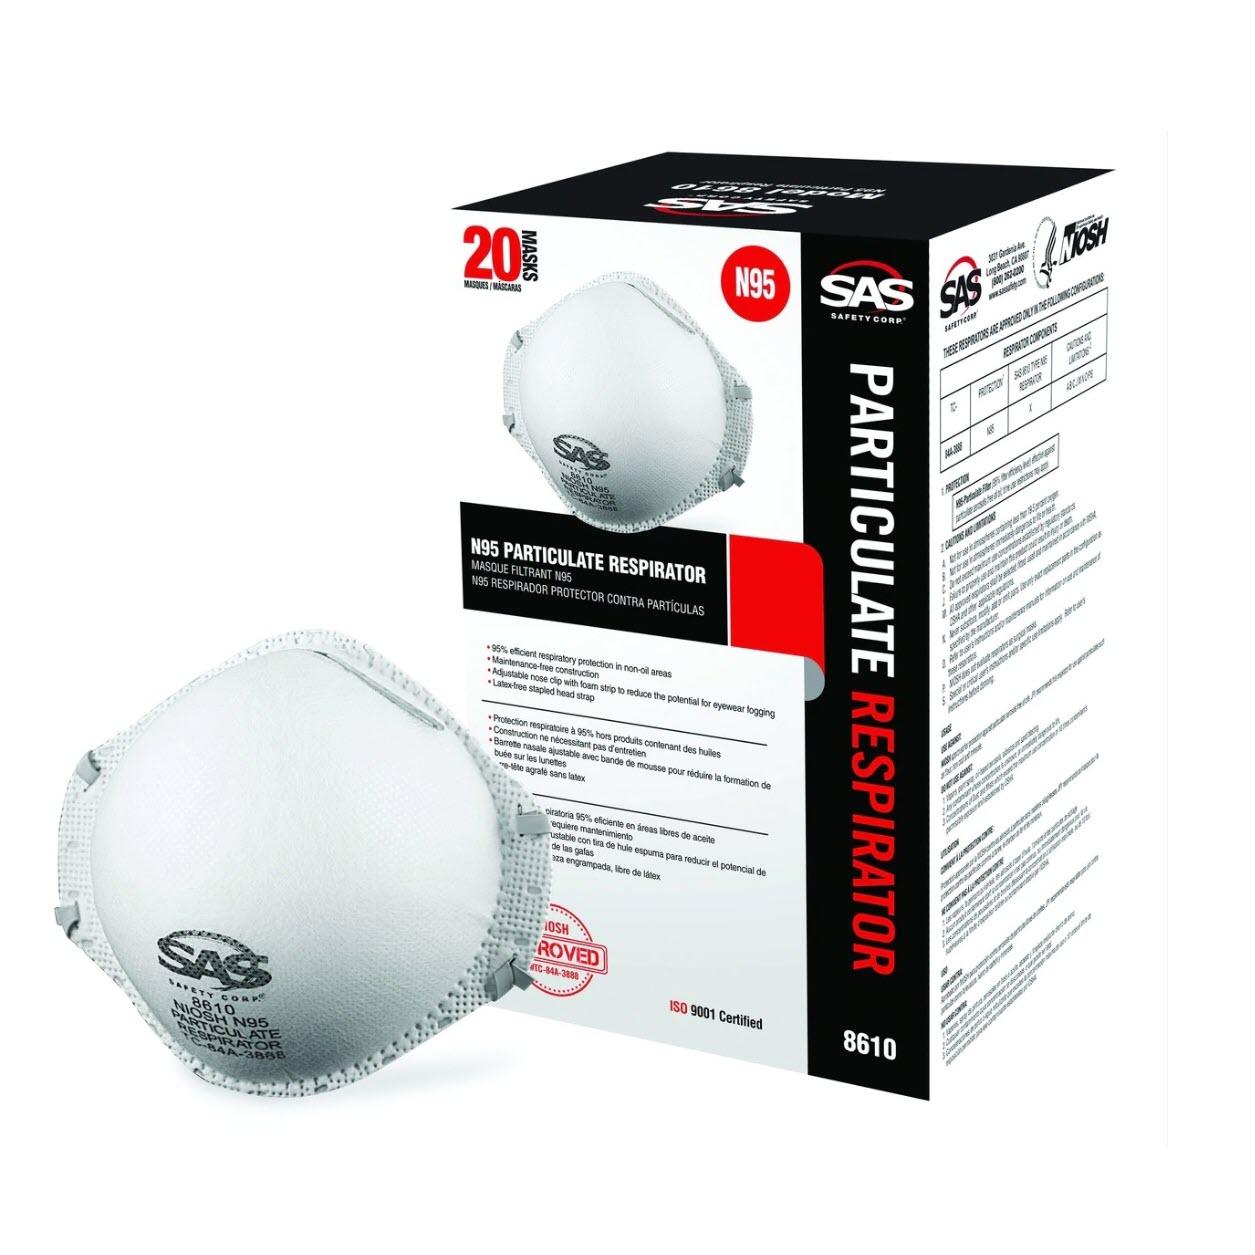 SAS® (8610) N95 Particulate Respirator, 20/box